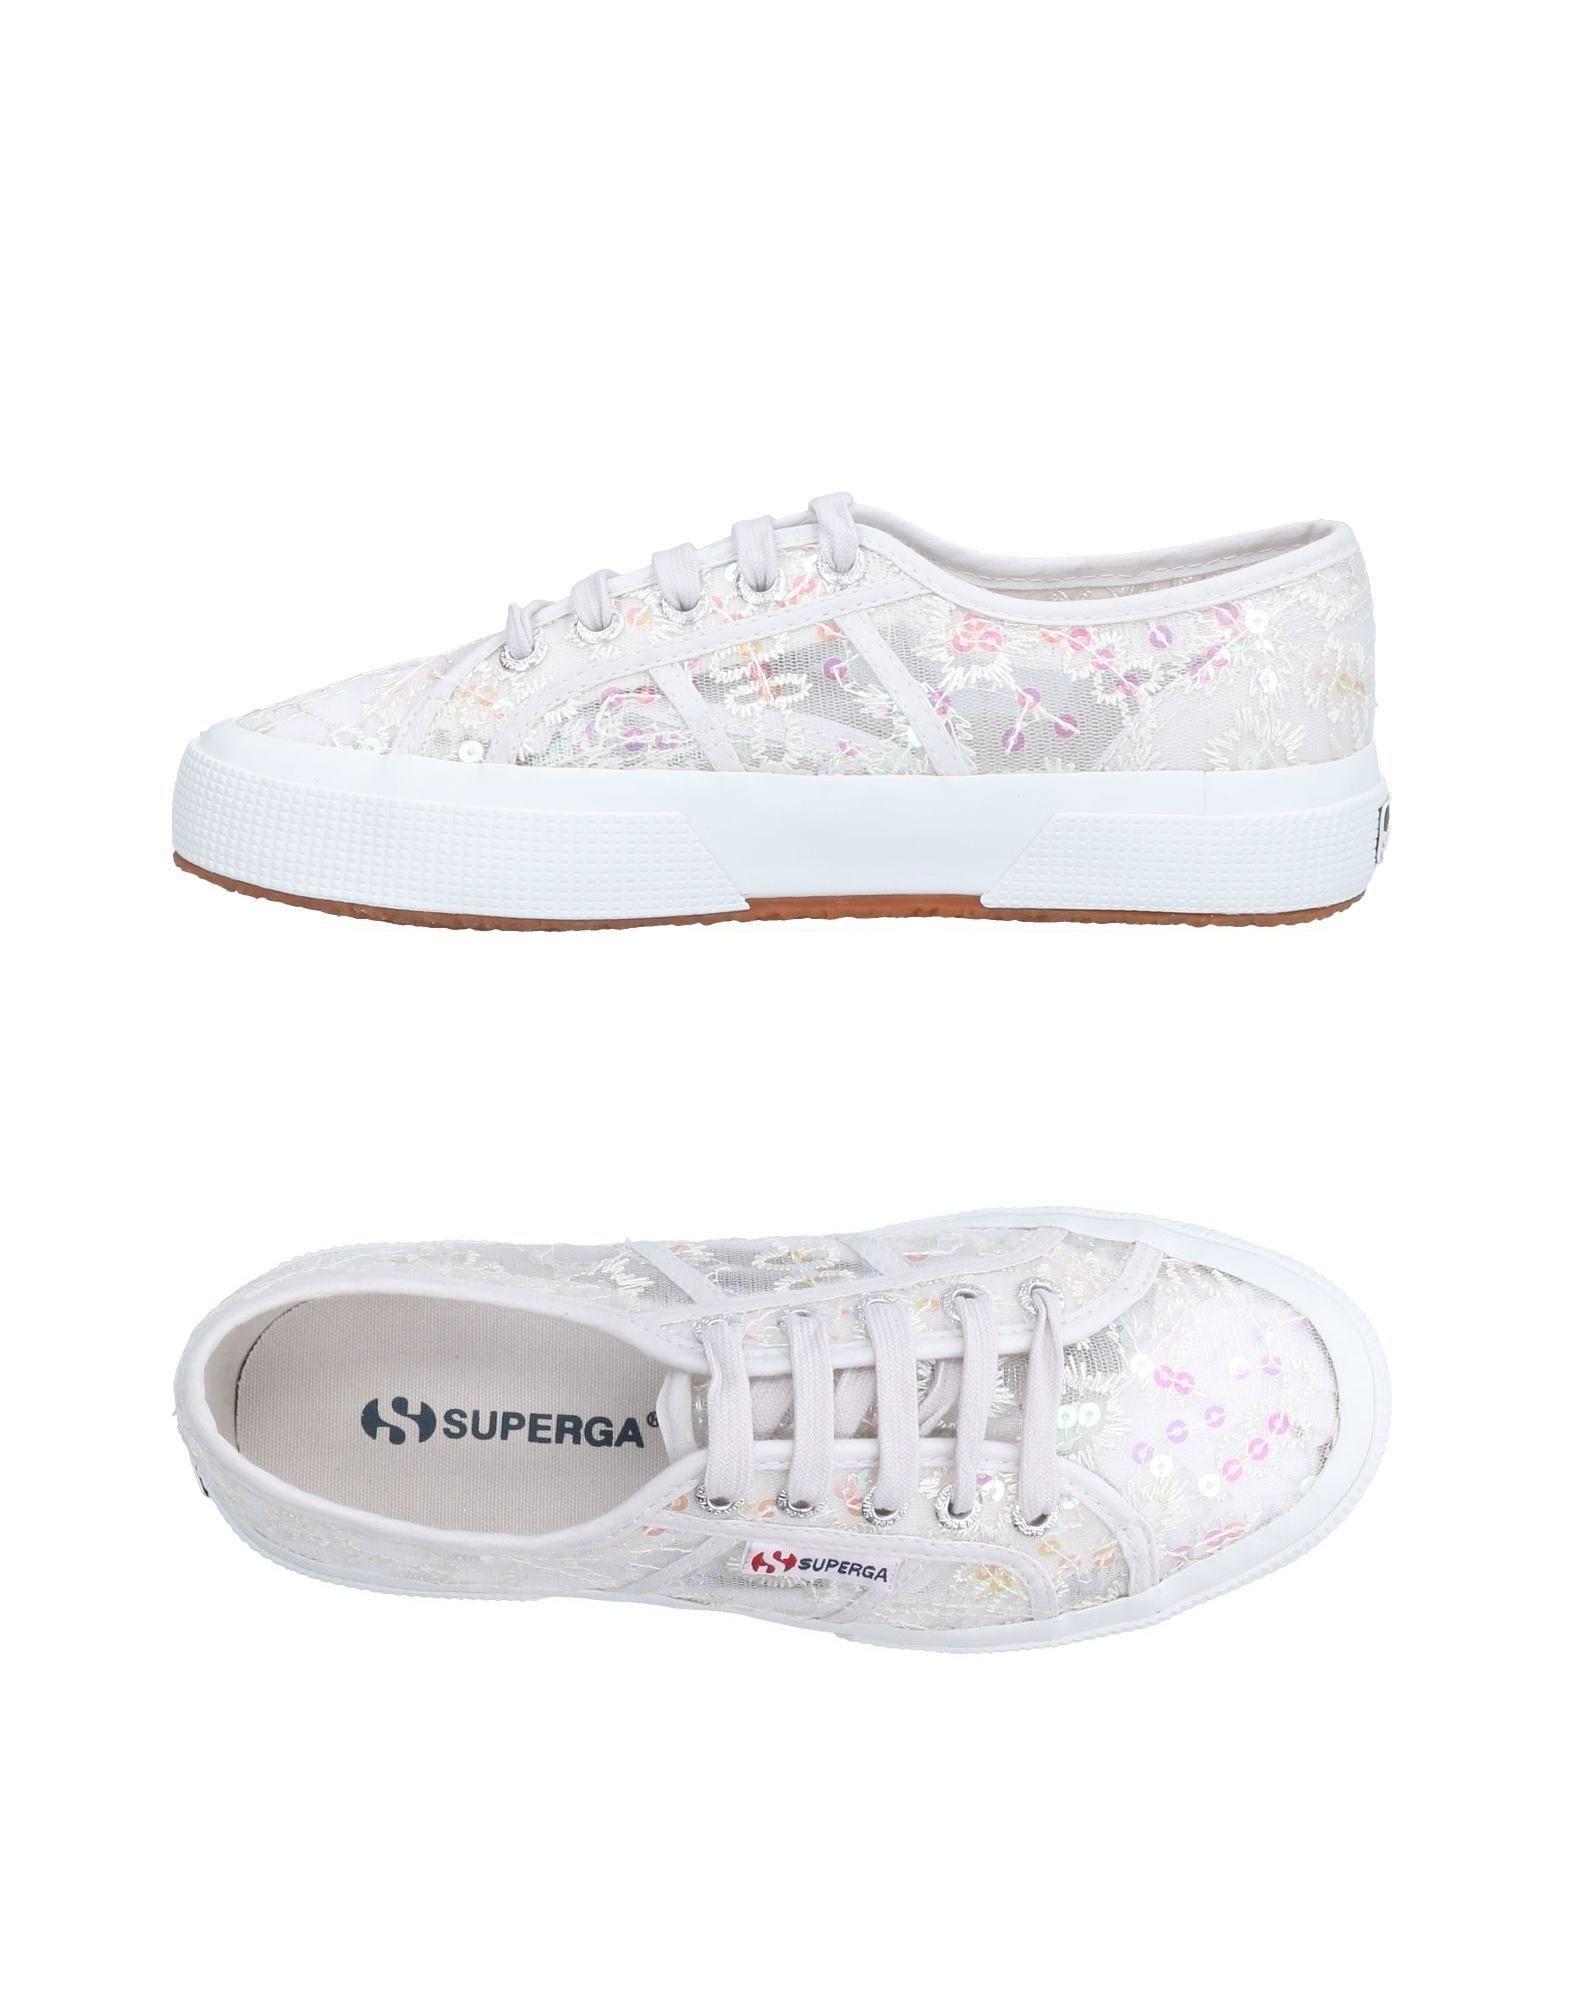 Superga White Low Top Sneakers